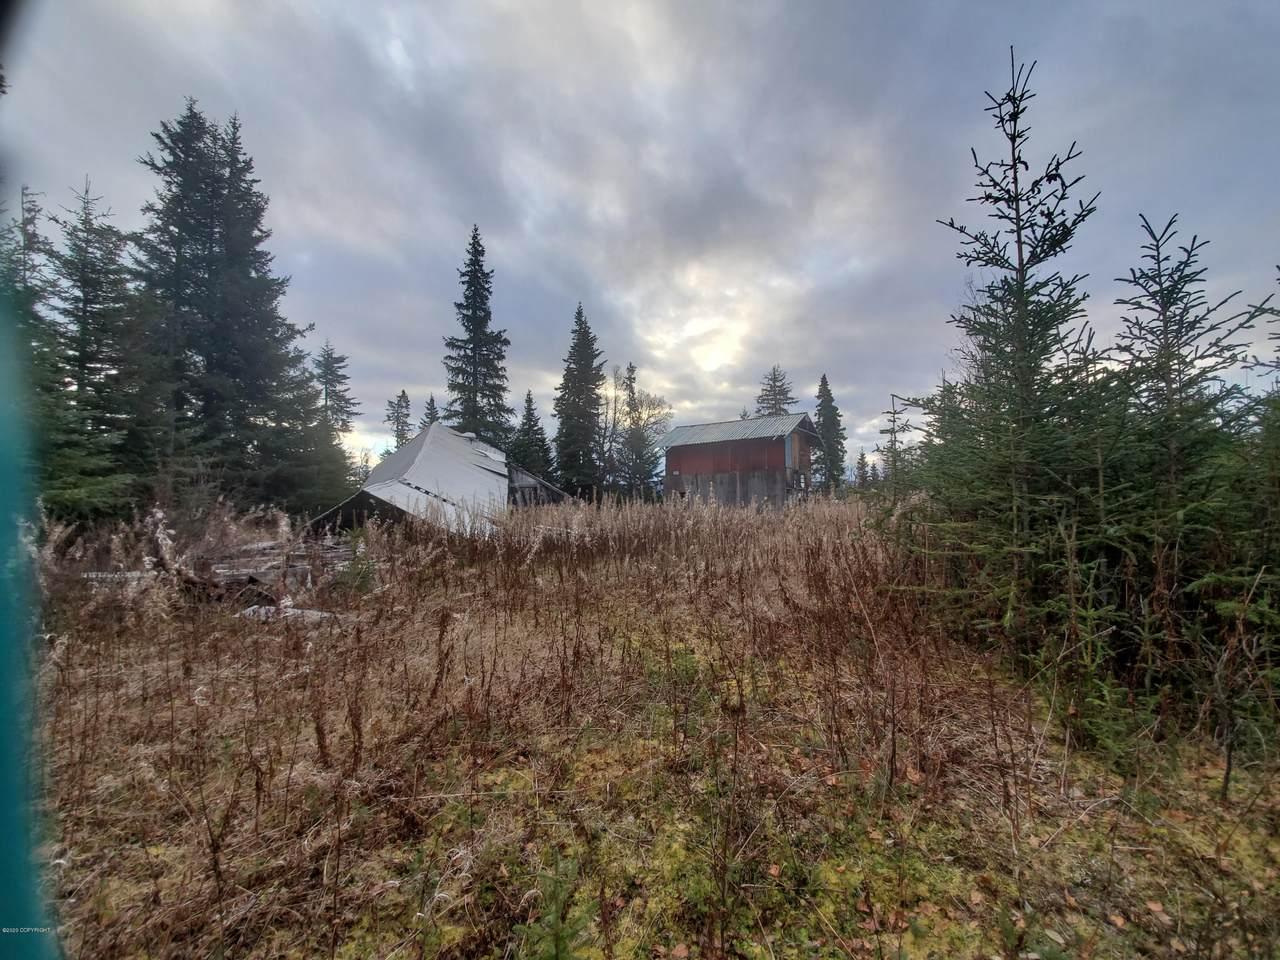 https://bt-photos.global.ssl.fastly.net/alaska/1280_boomver_1_20-16643-2.jpg